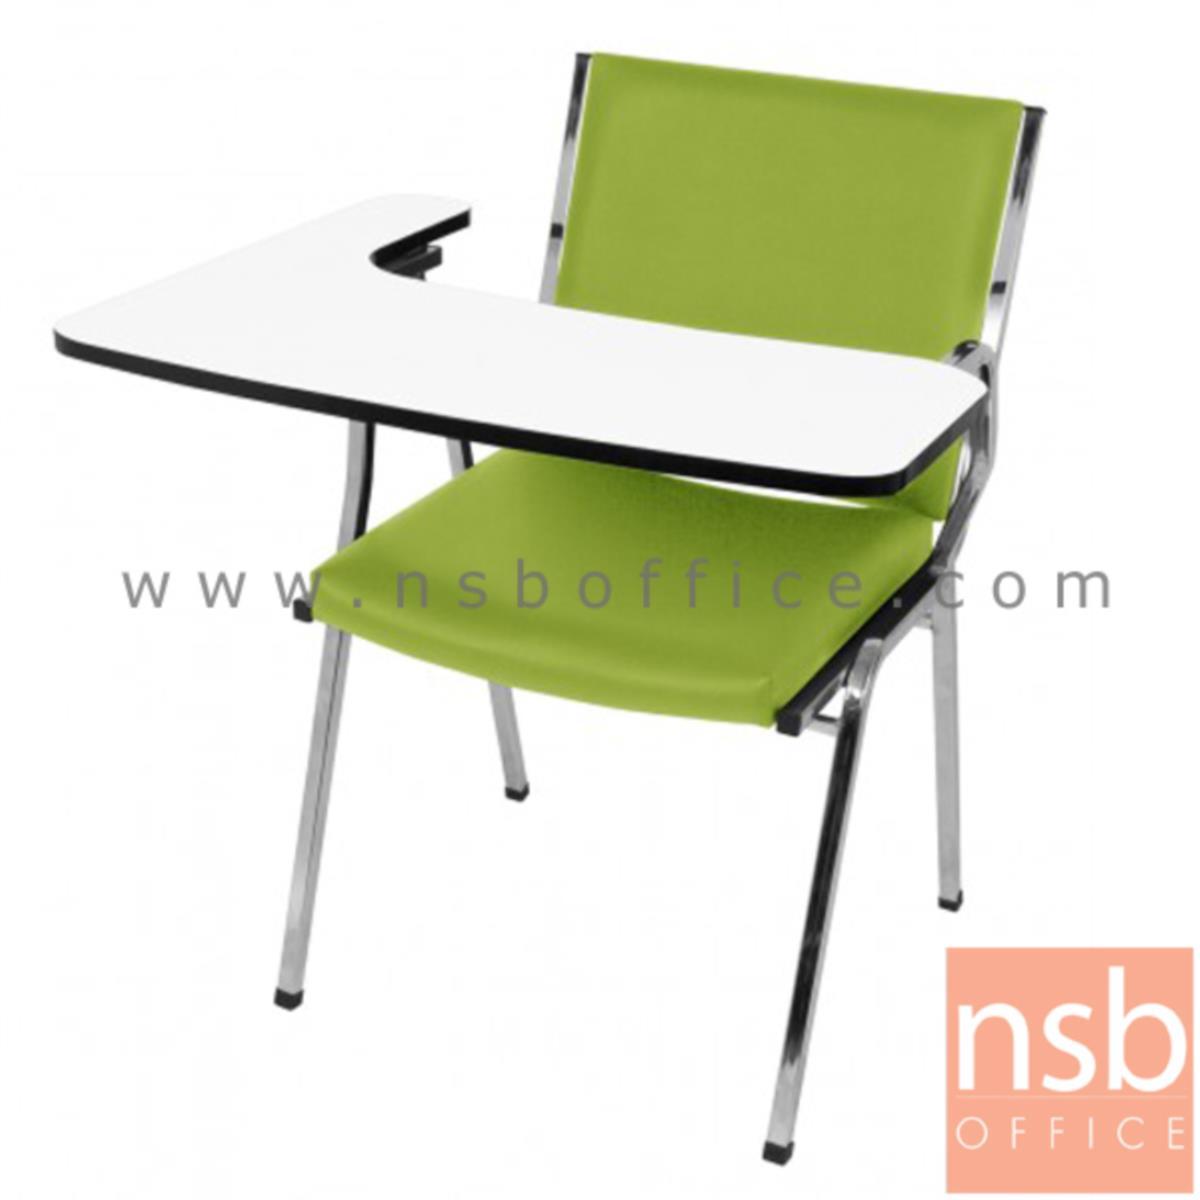 B07A086:เก้าอี้เลคเชอร์ รุ่น PC-CLR40N ขาเหล็กชุบโครเมี่ยม